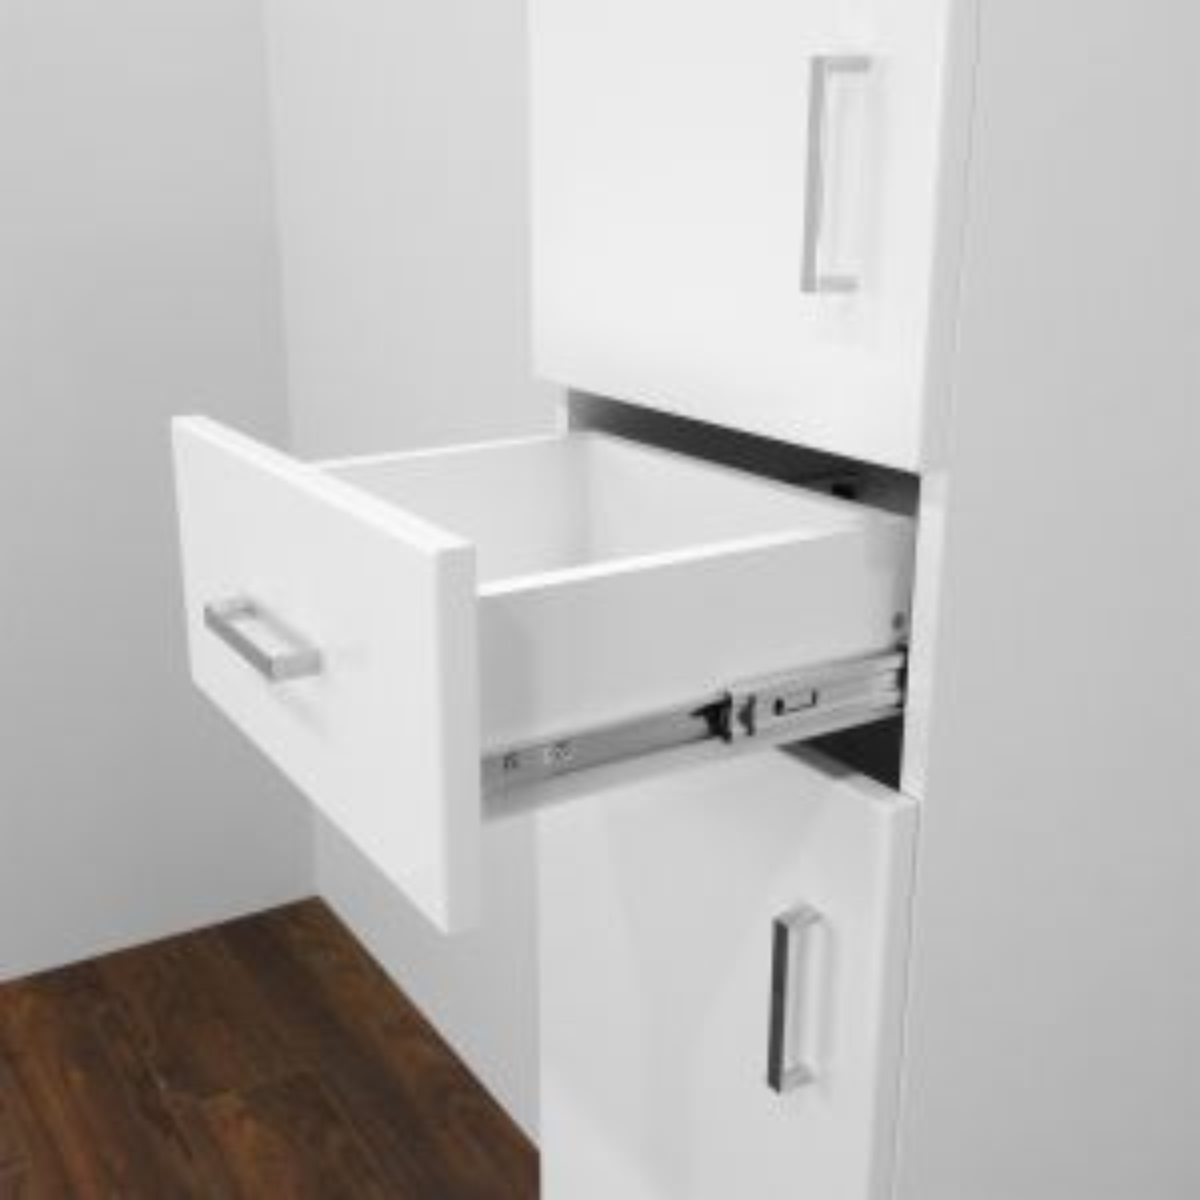 Premier High Gloss White Tall Boy Storage Unit Drawer